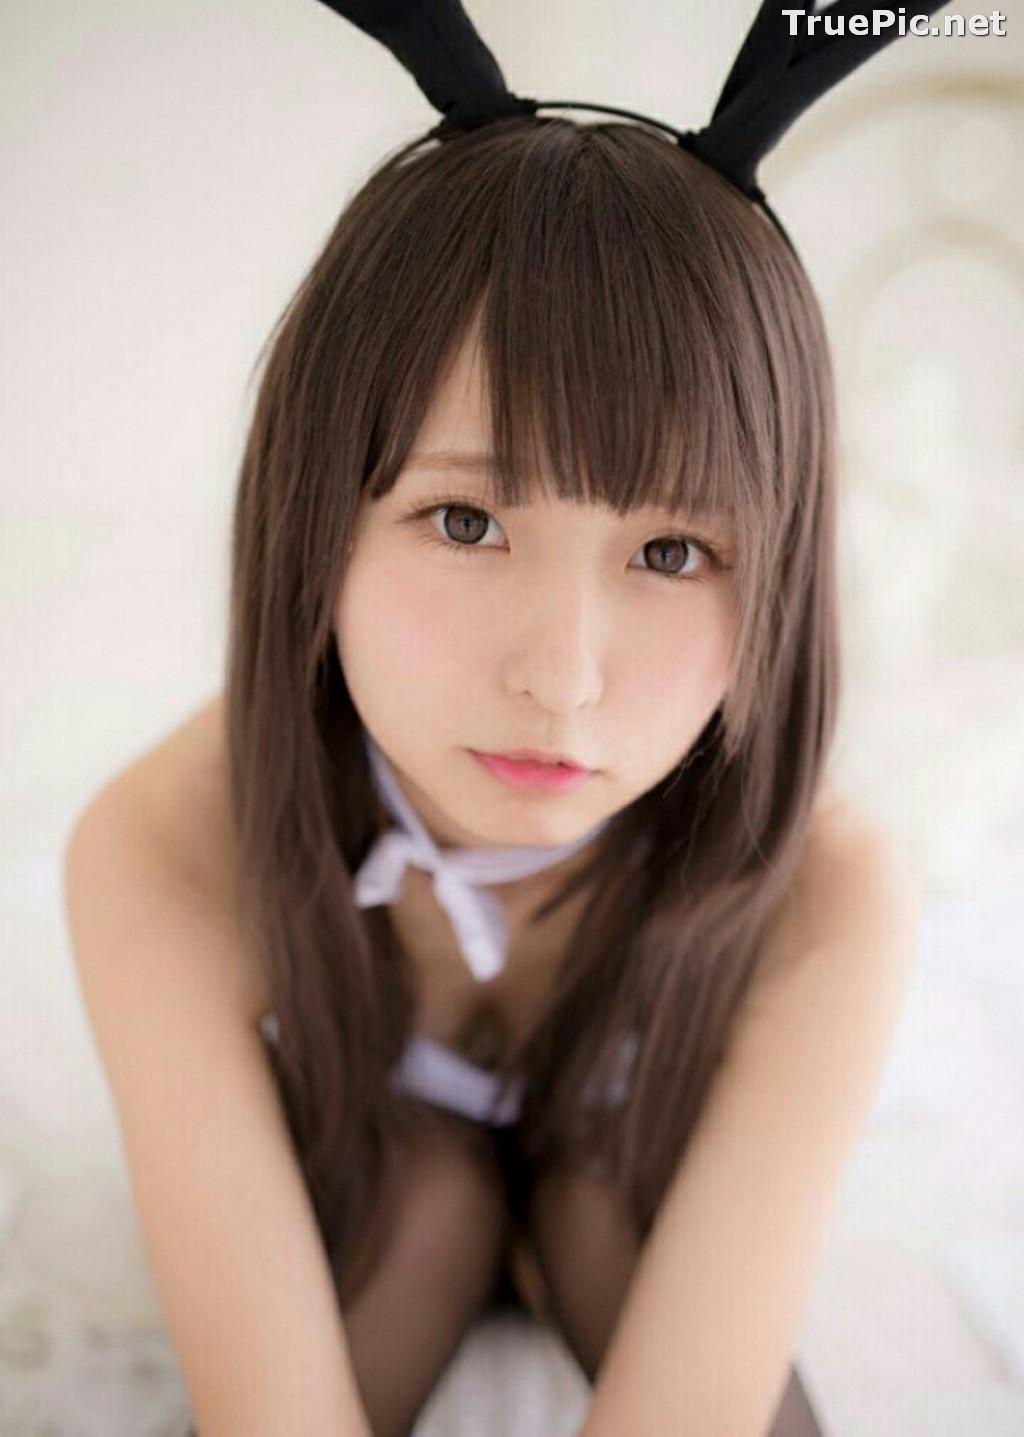 Image Japanese Model - Ennui Mamefu - Cute Cosplay Girl - TruePic.net - Picture-1